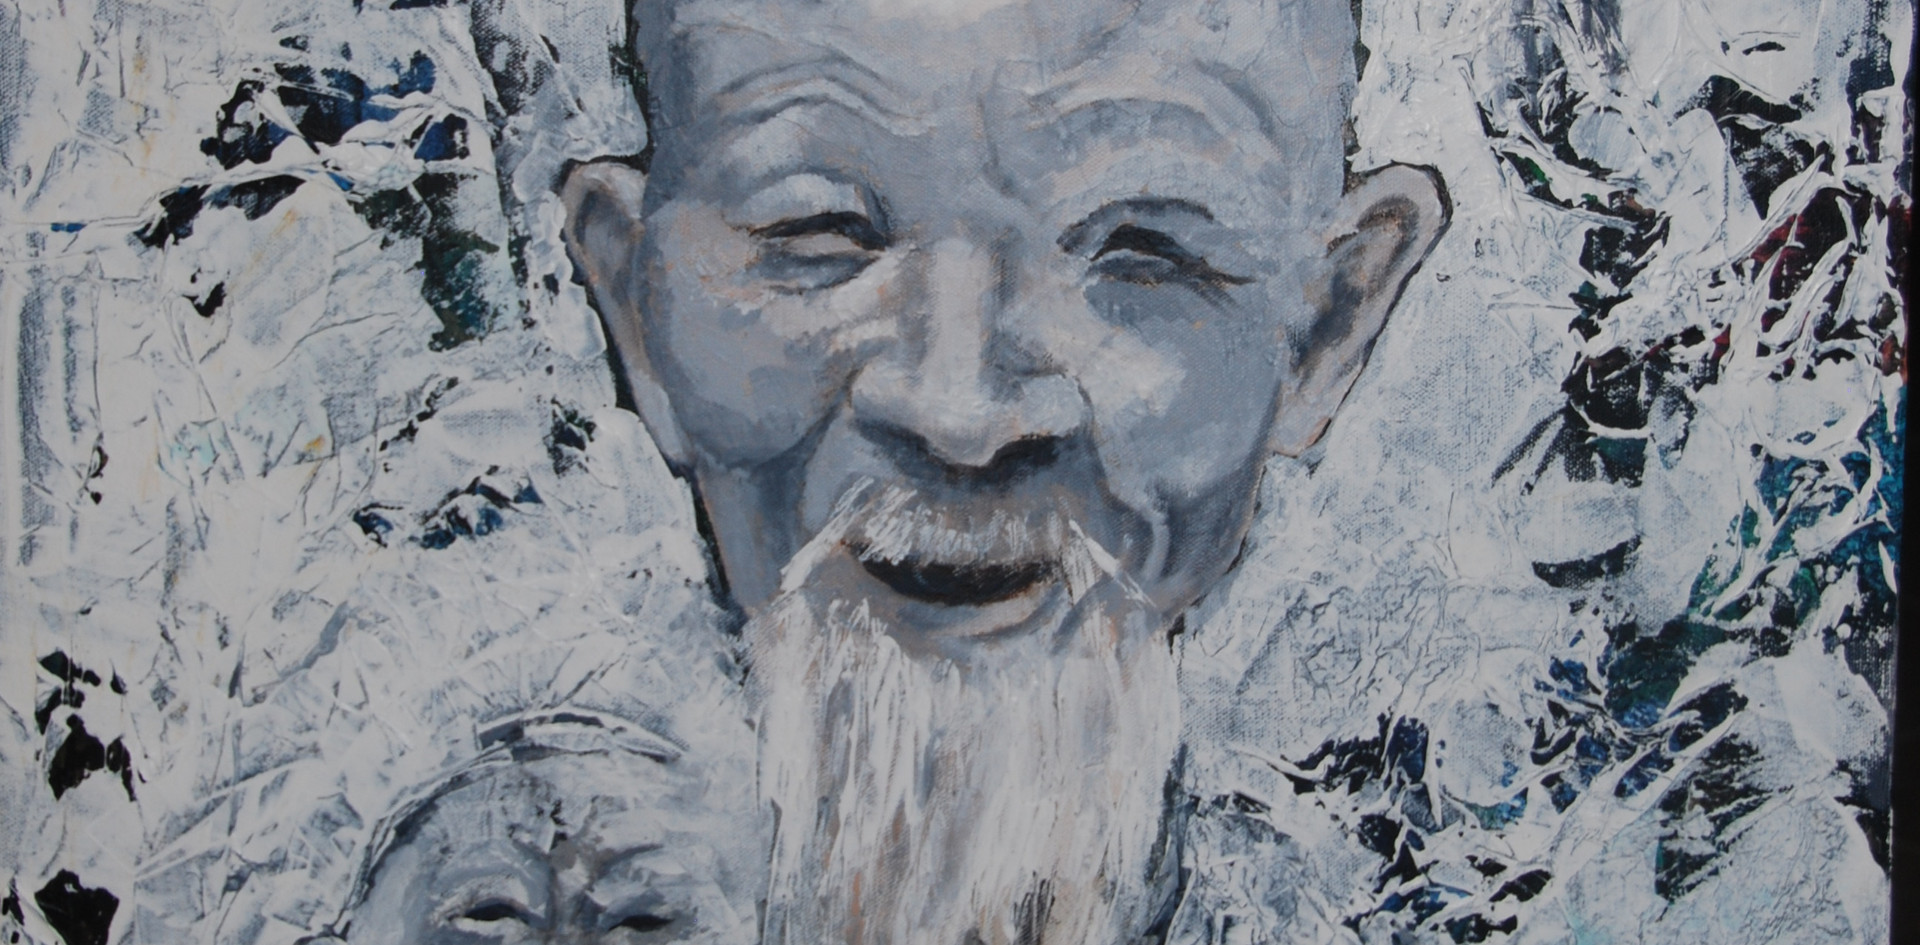 Asian Faces